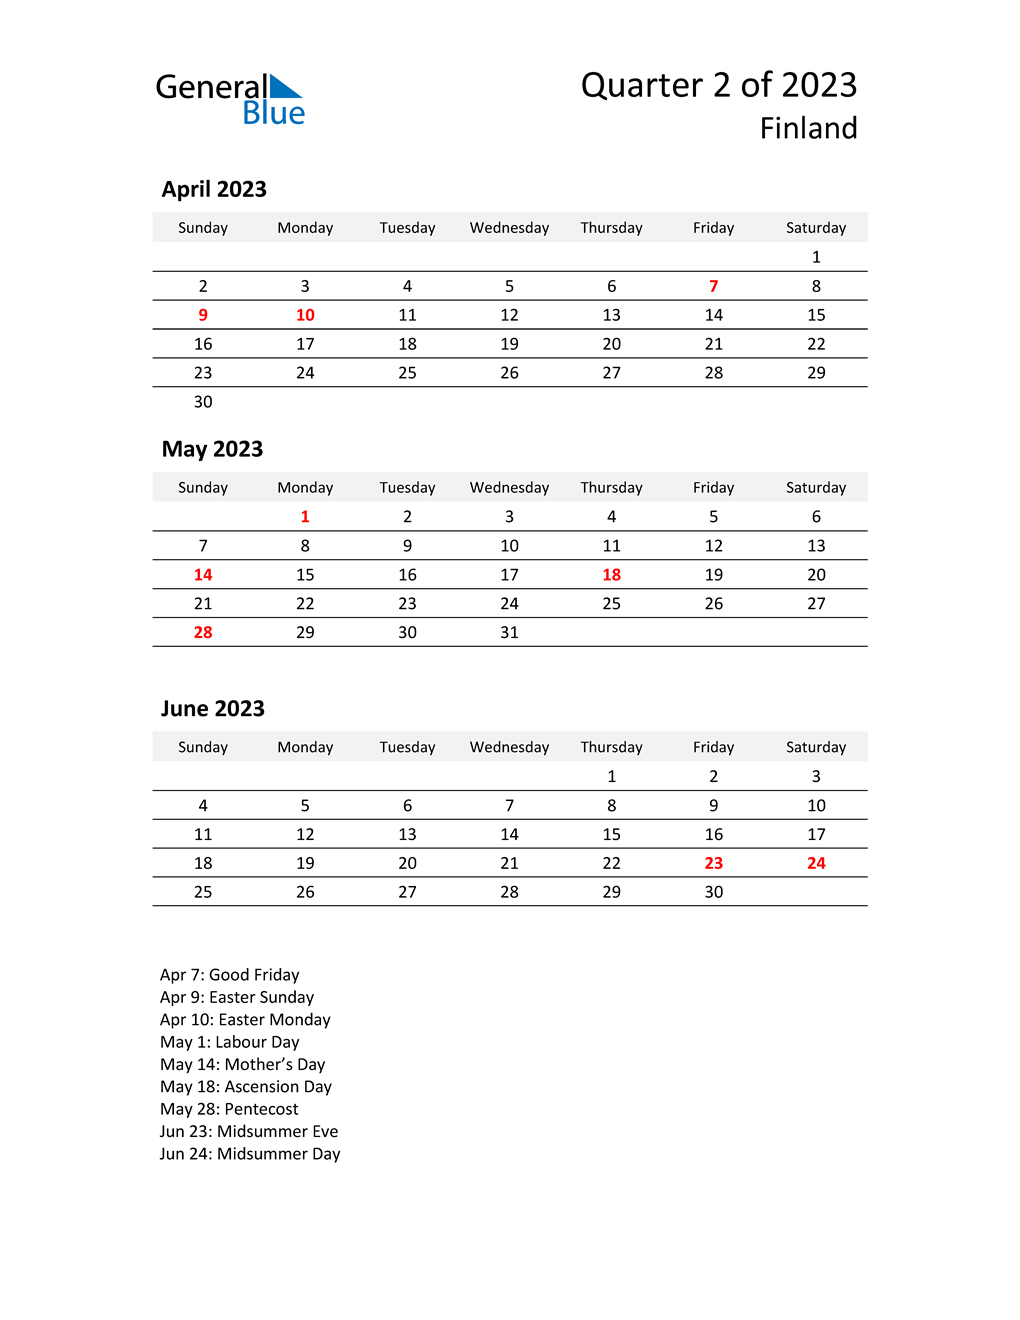 2023 Three-Month Calendar for Finland